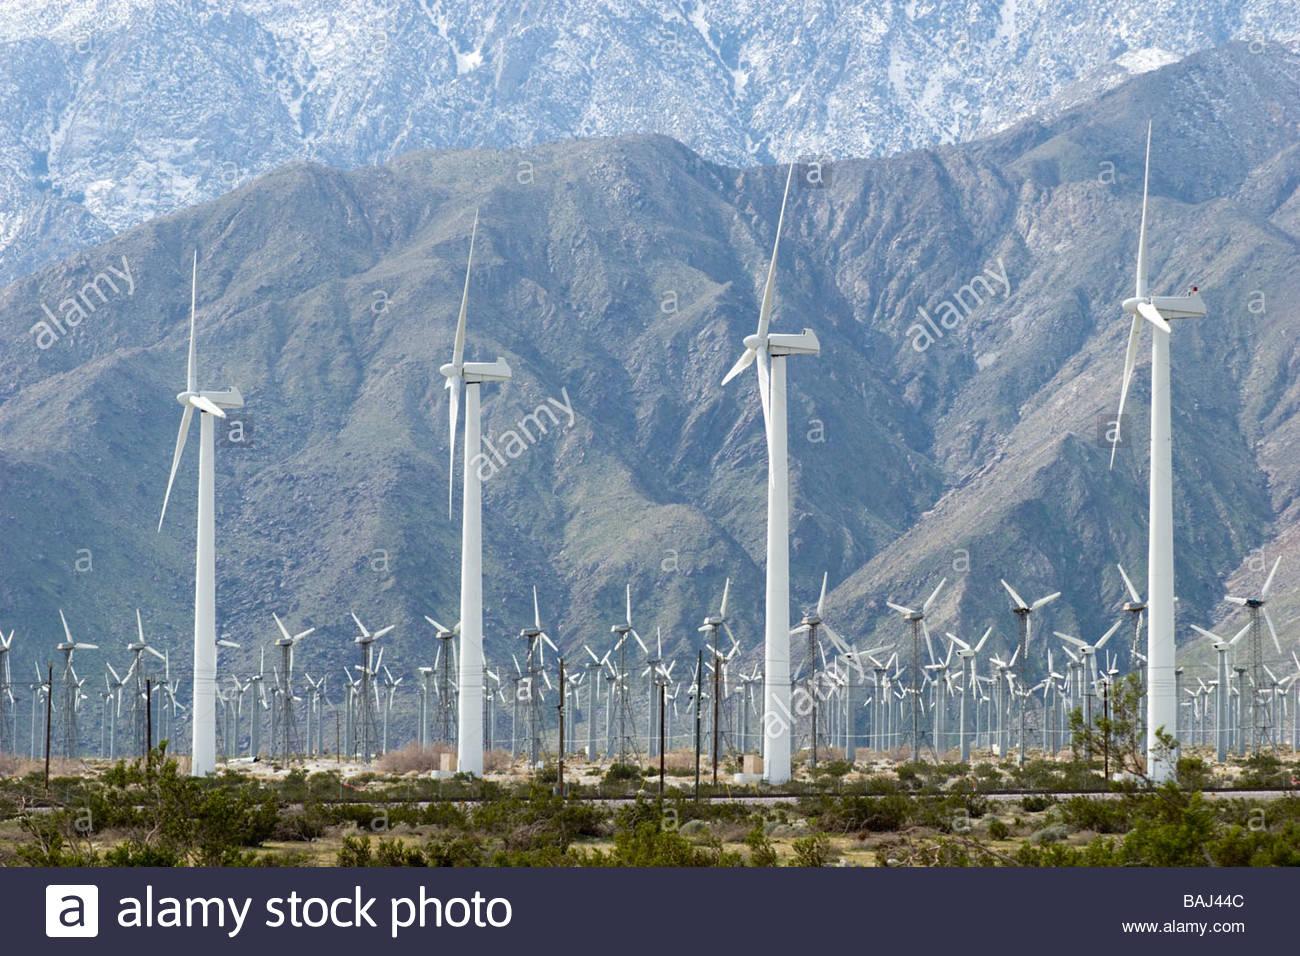 Wind Farm Palm Springs California - Stock Image